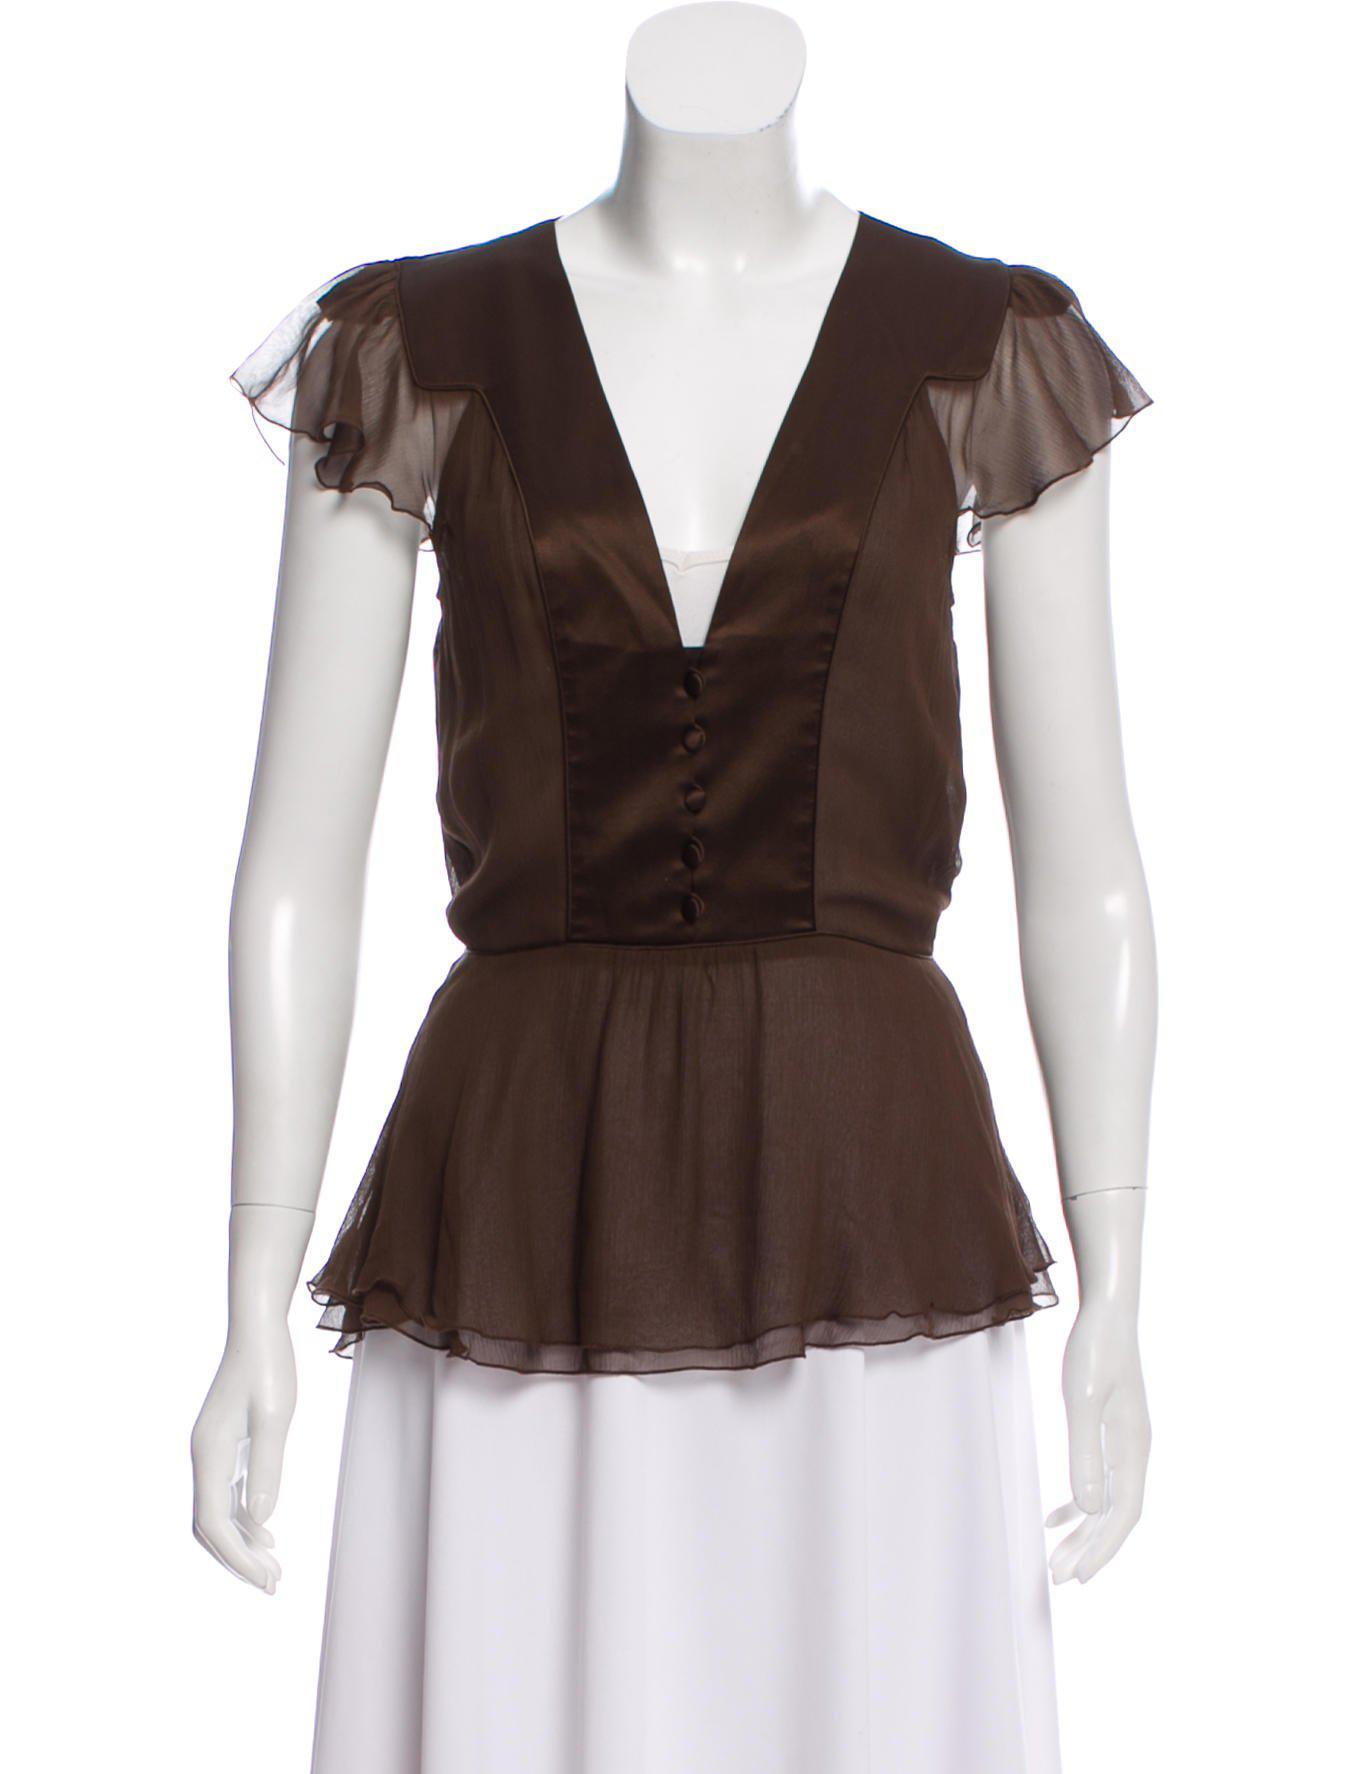 Many Kinds Of Cheap Price View Cheap Price Diane von Furstenberg Lidiya Silk Top Huge Surprise For Sale Largest Supplier Online 9vdafa